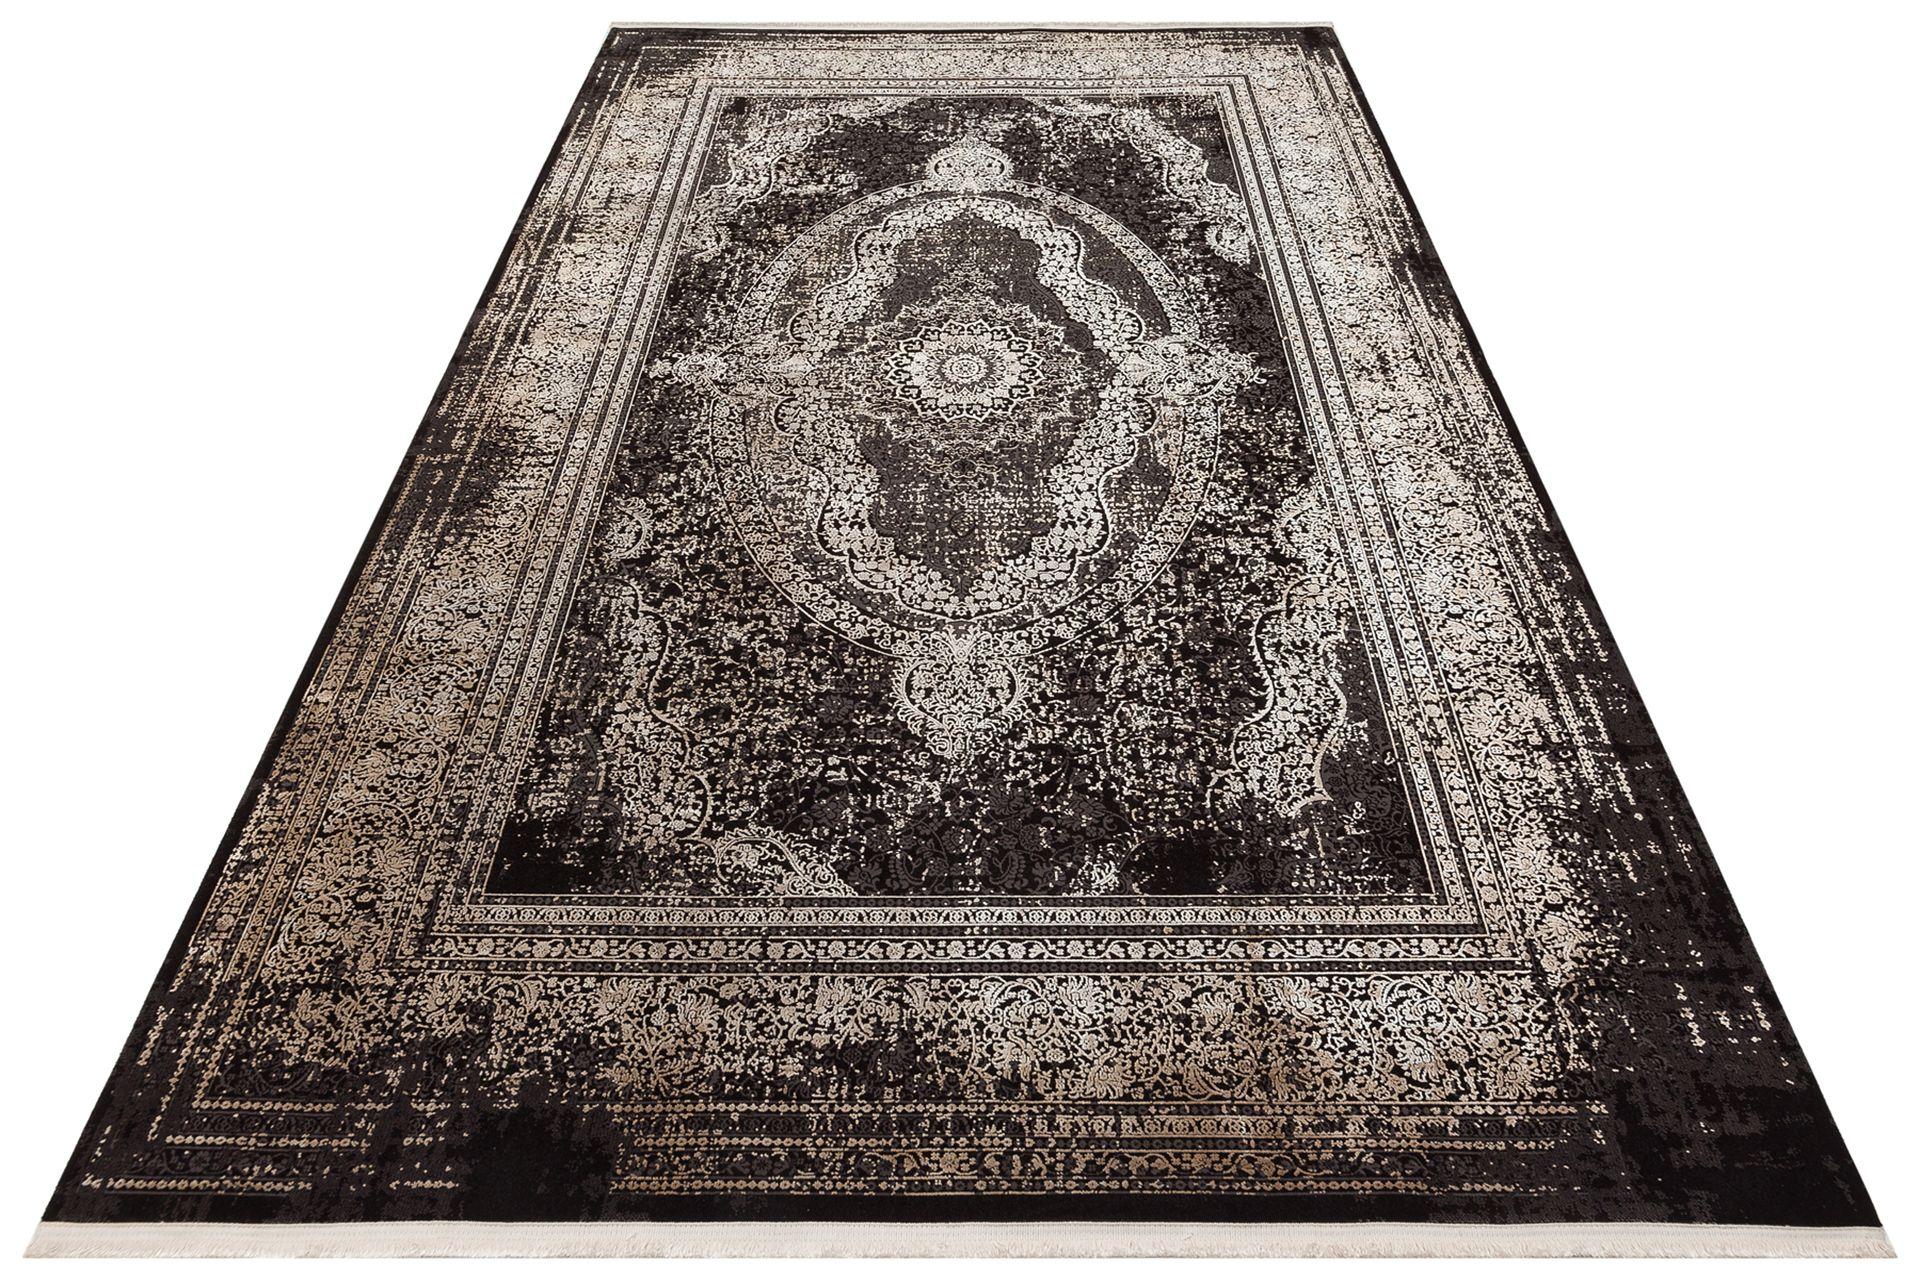 ANADOLU AD 01 ANTRASİT BEJ KLASİK DESENLİ SALON HALISI 100x300